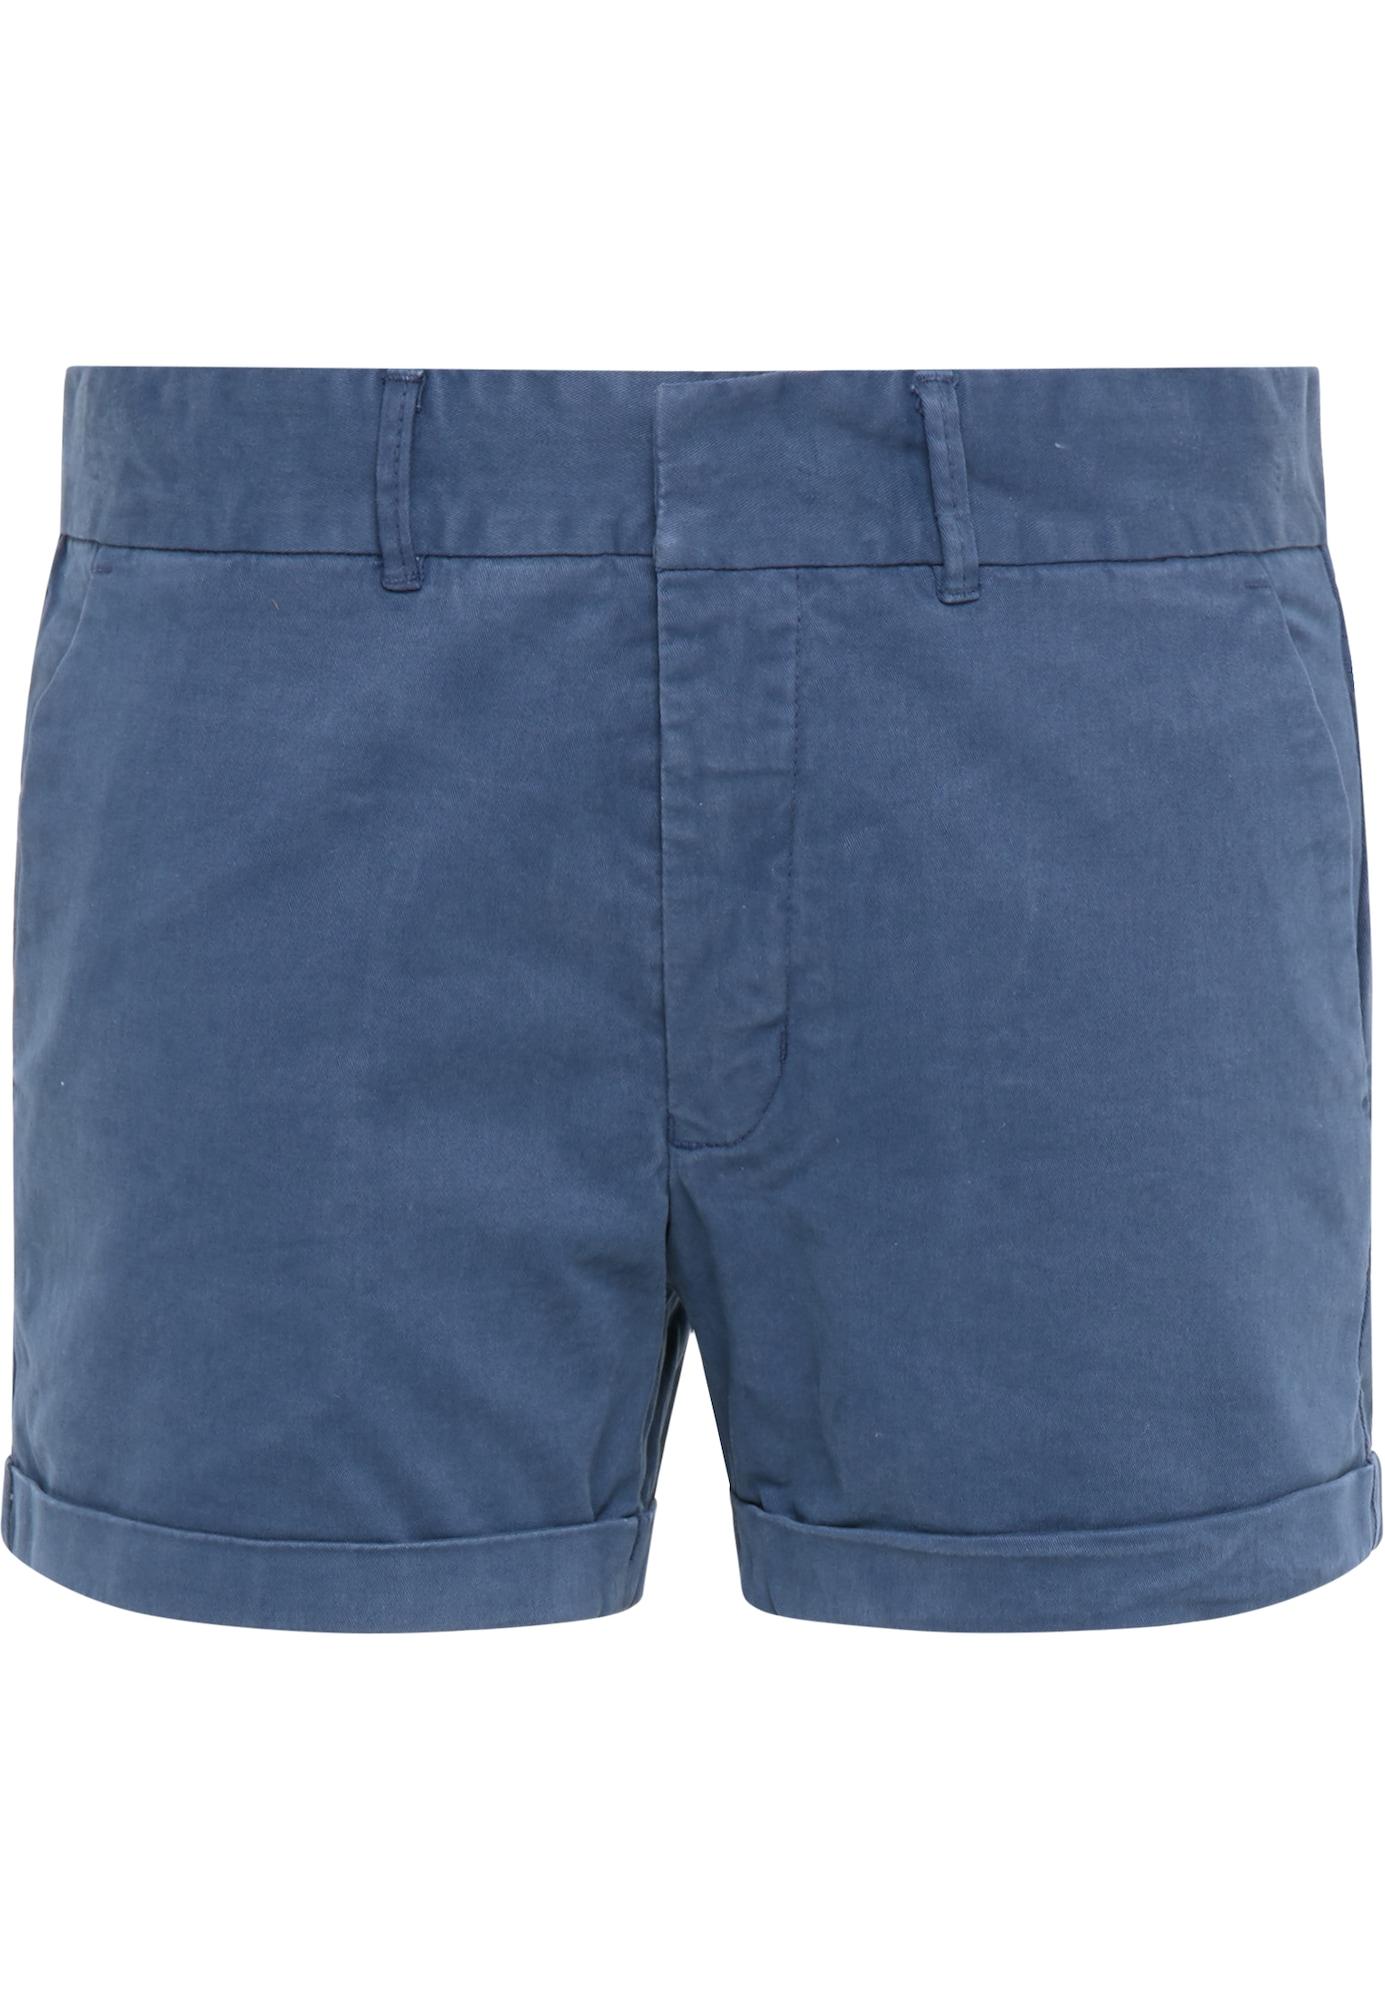 DreiMaster Vintage Kelnės mėlyna